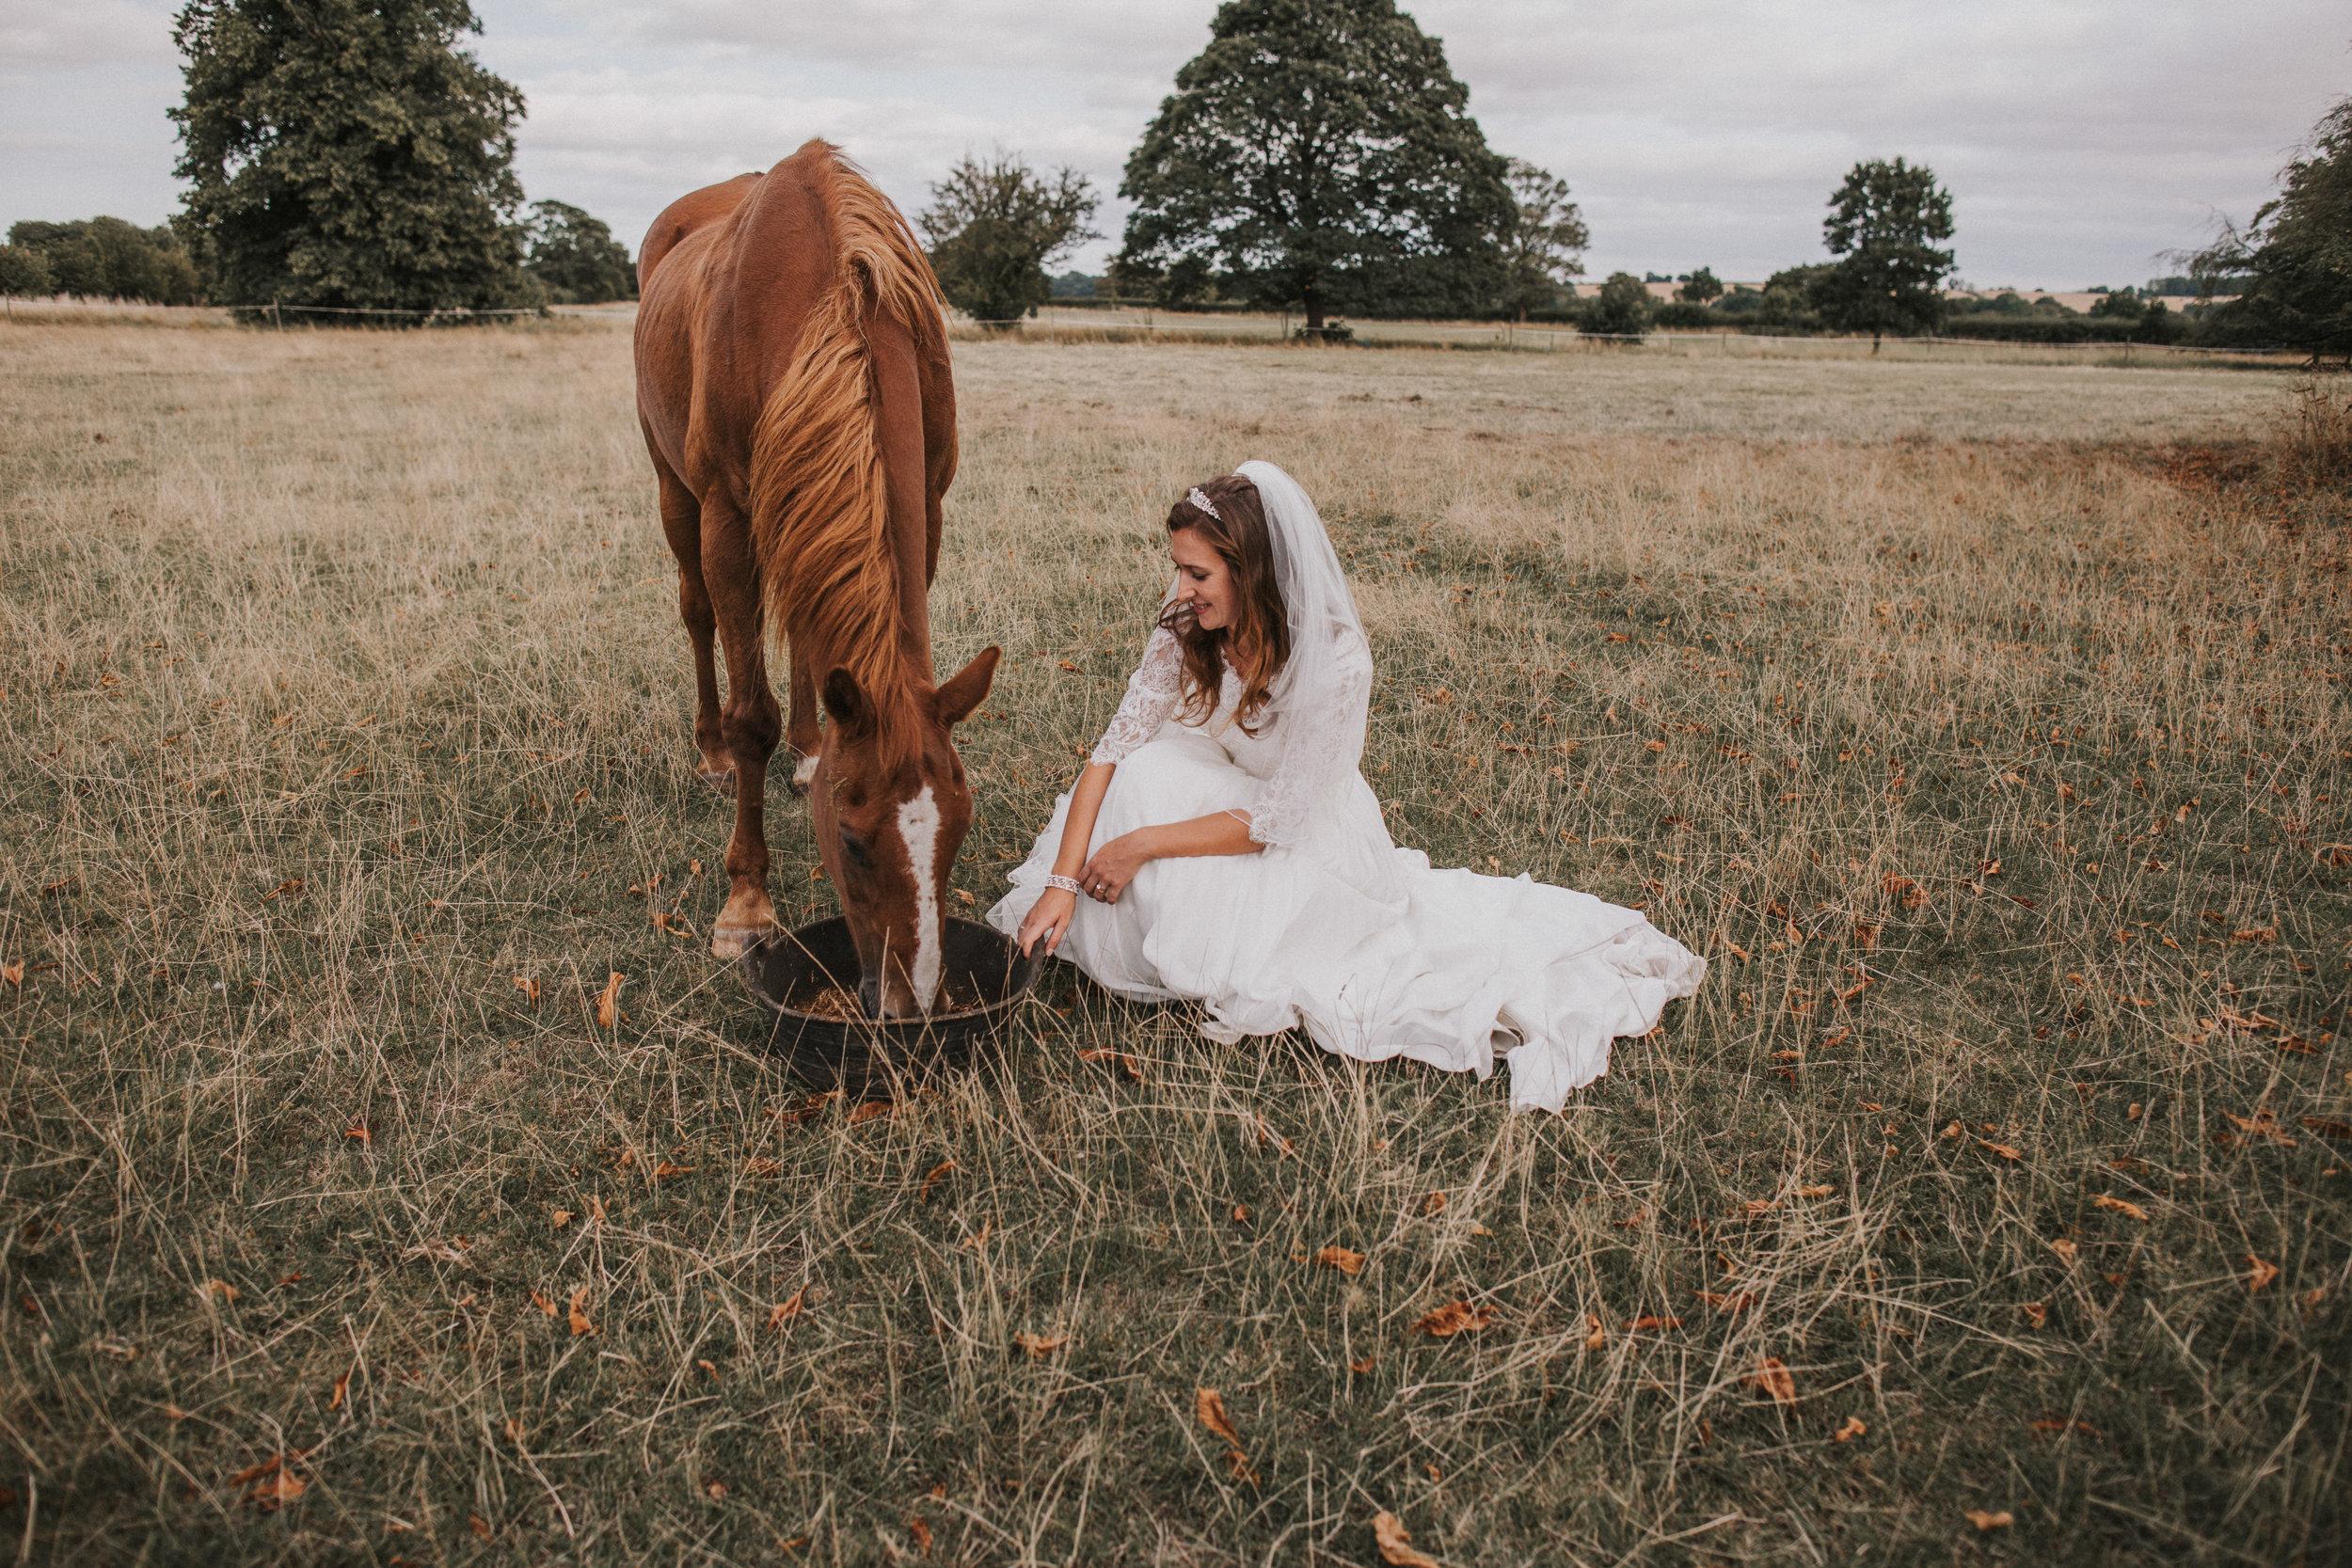 brook rose photography  Farm wedding_199.jpg